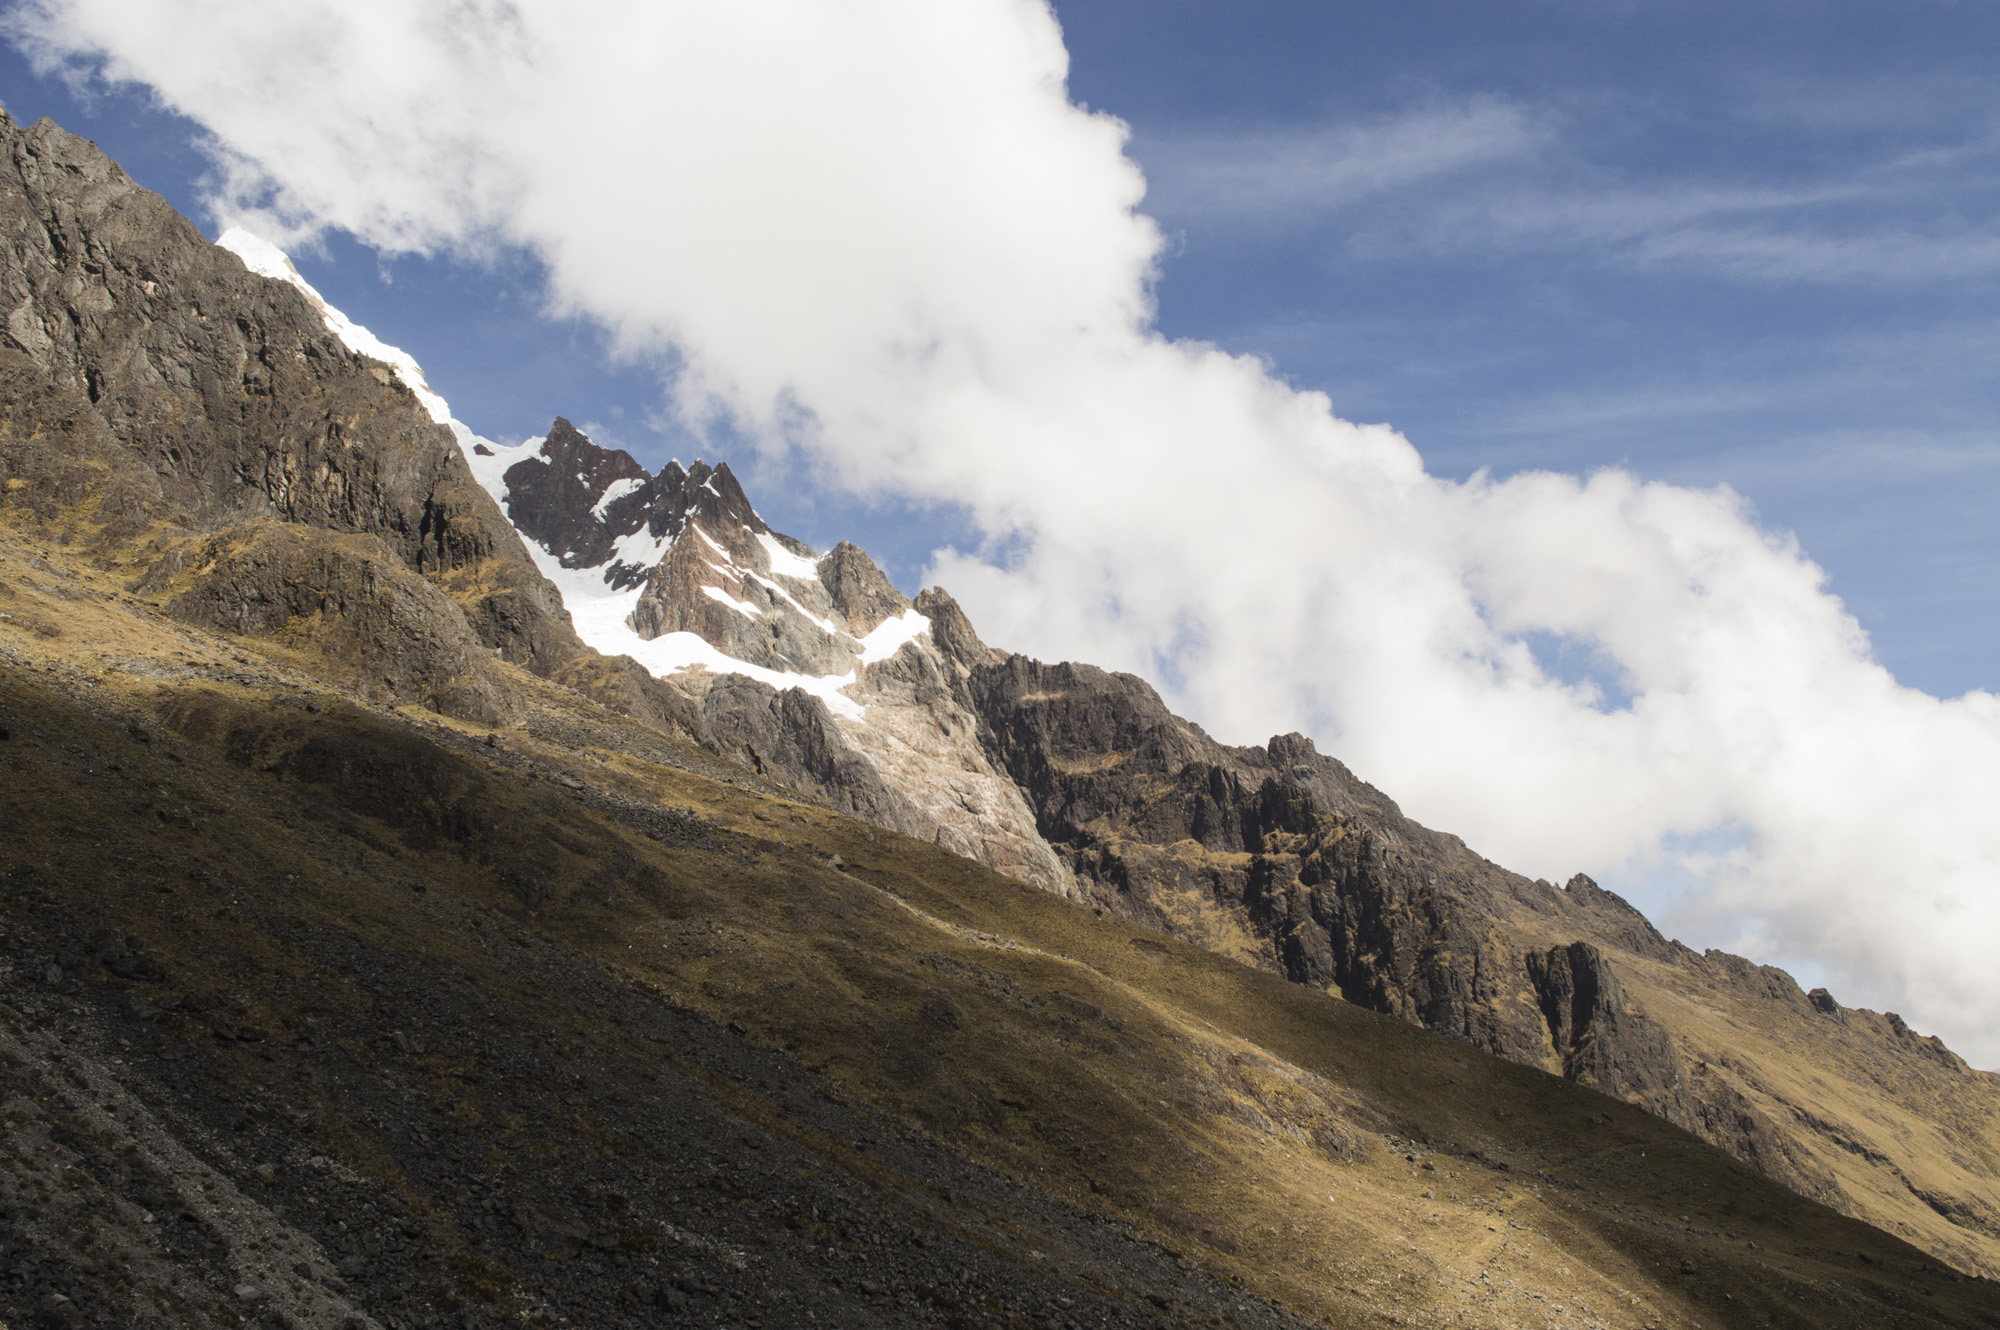 Inca 2 sun and shadow landscape.jpg